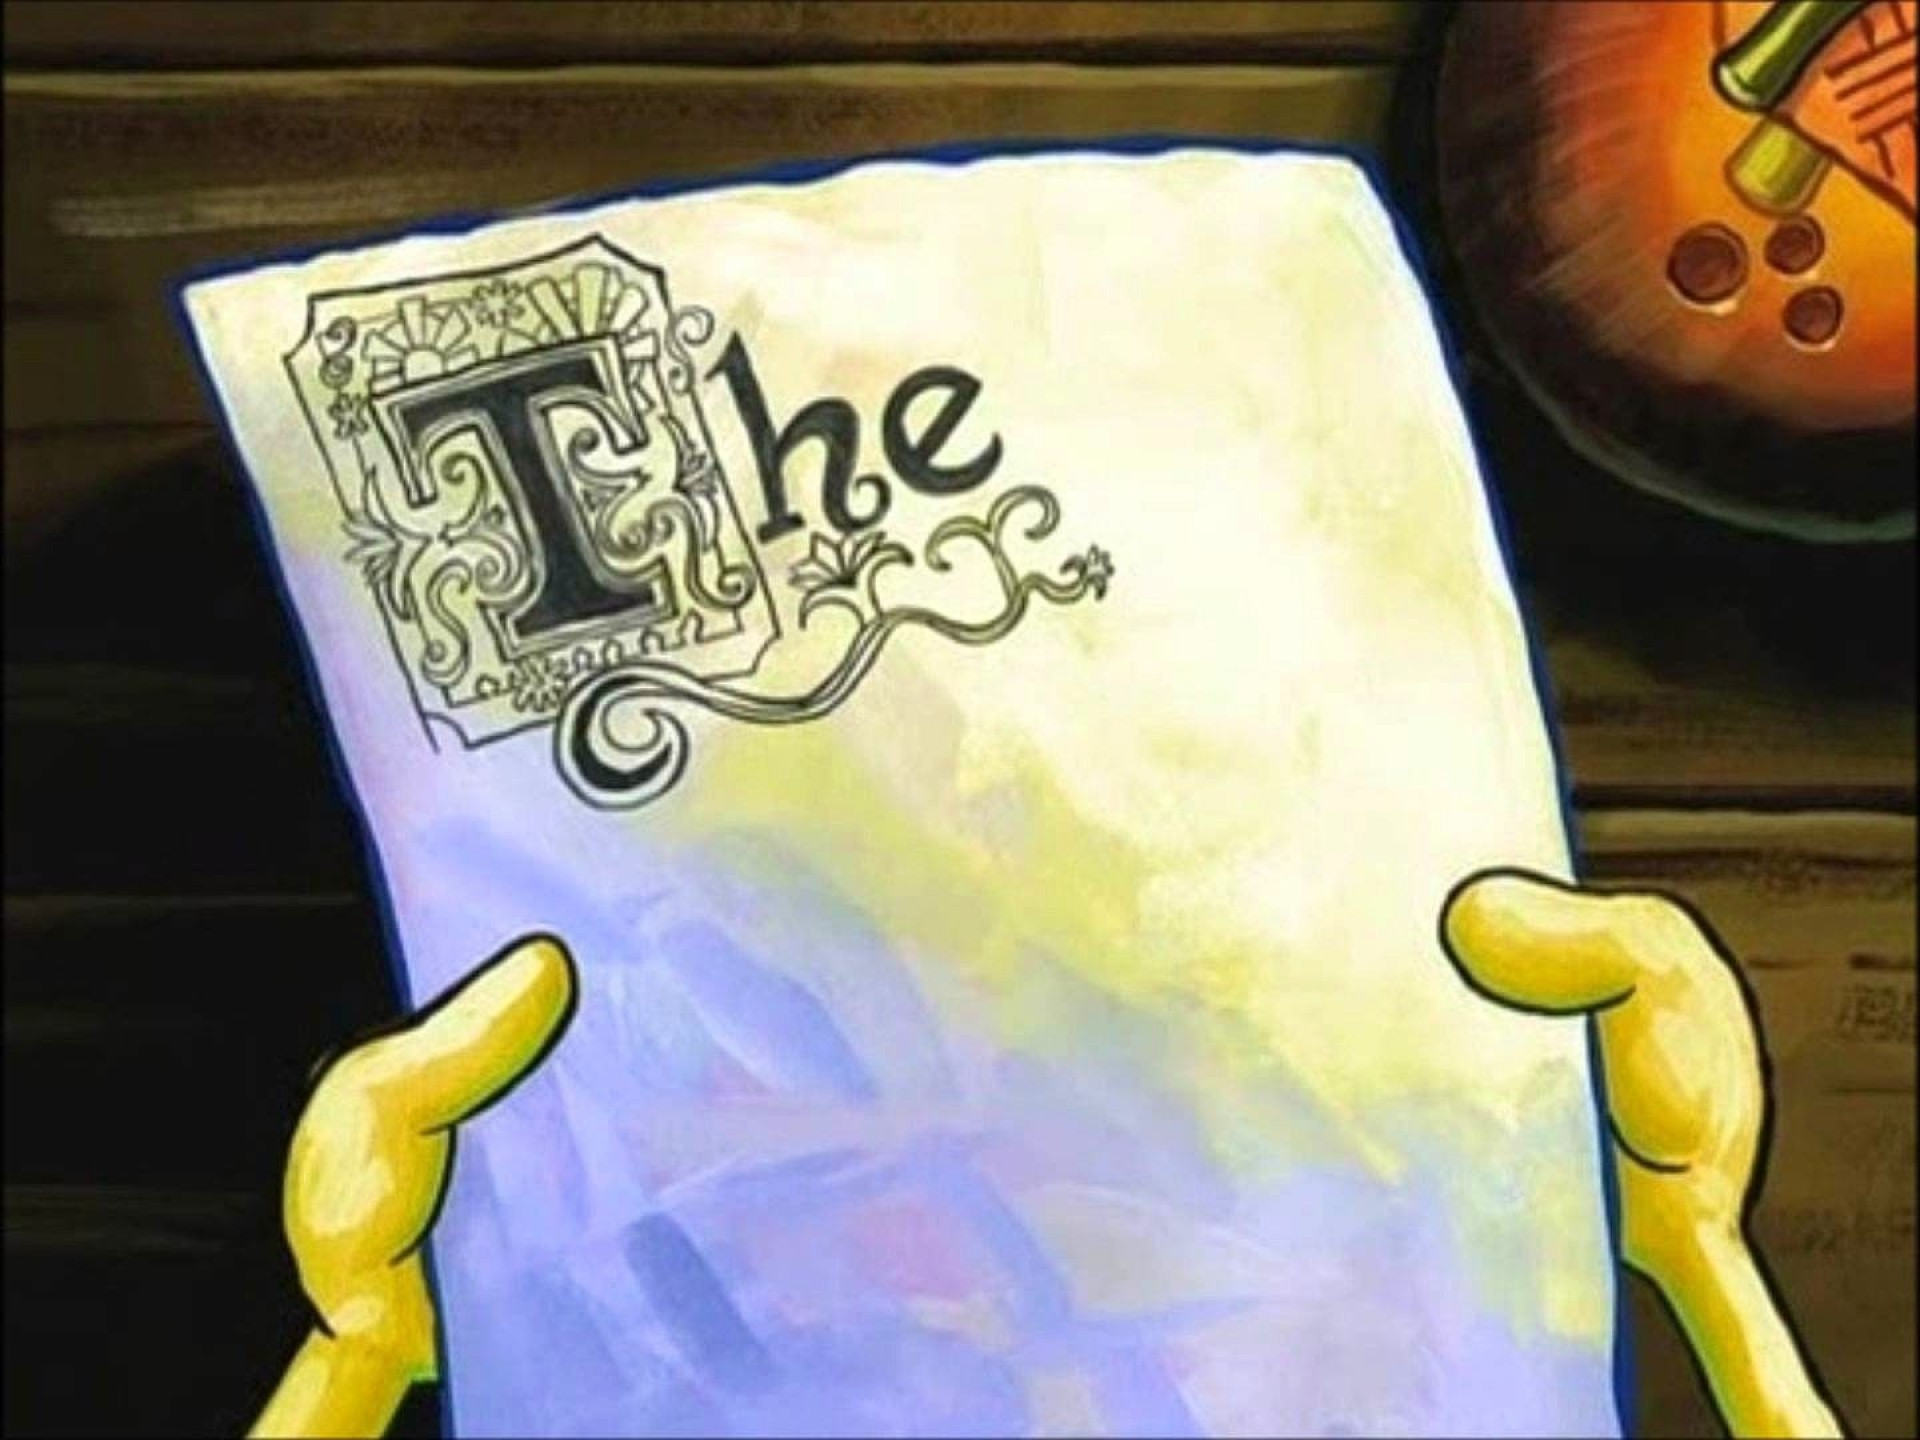 003 Essay Example Spongebob Unforgettable The Font Copy And Paste Gif Meme 1920